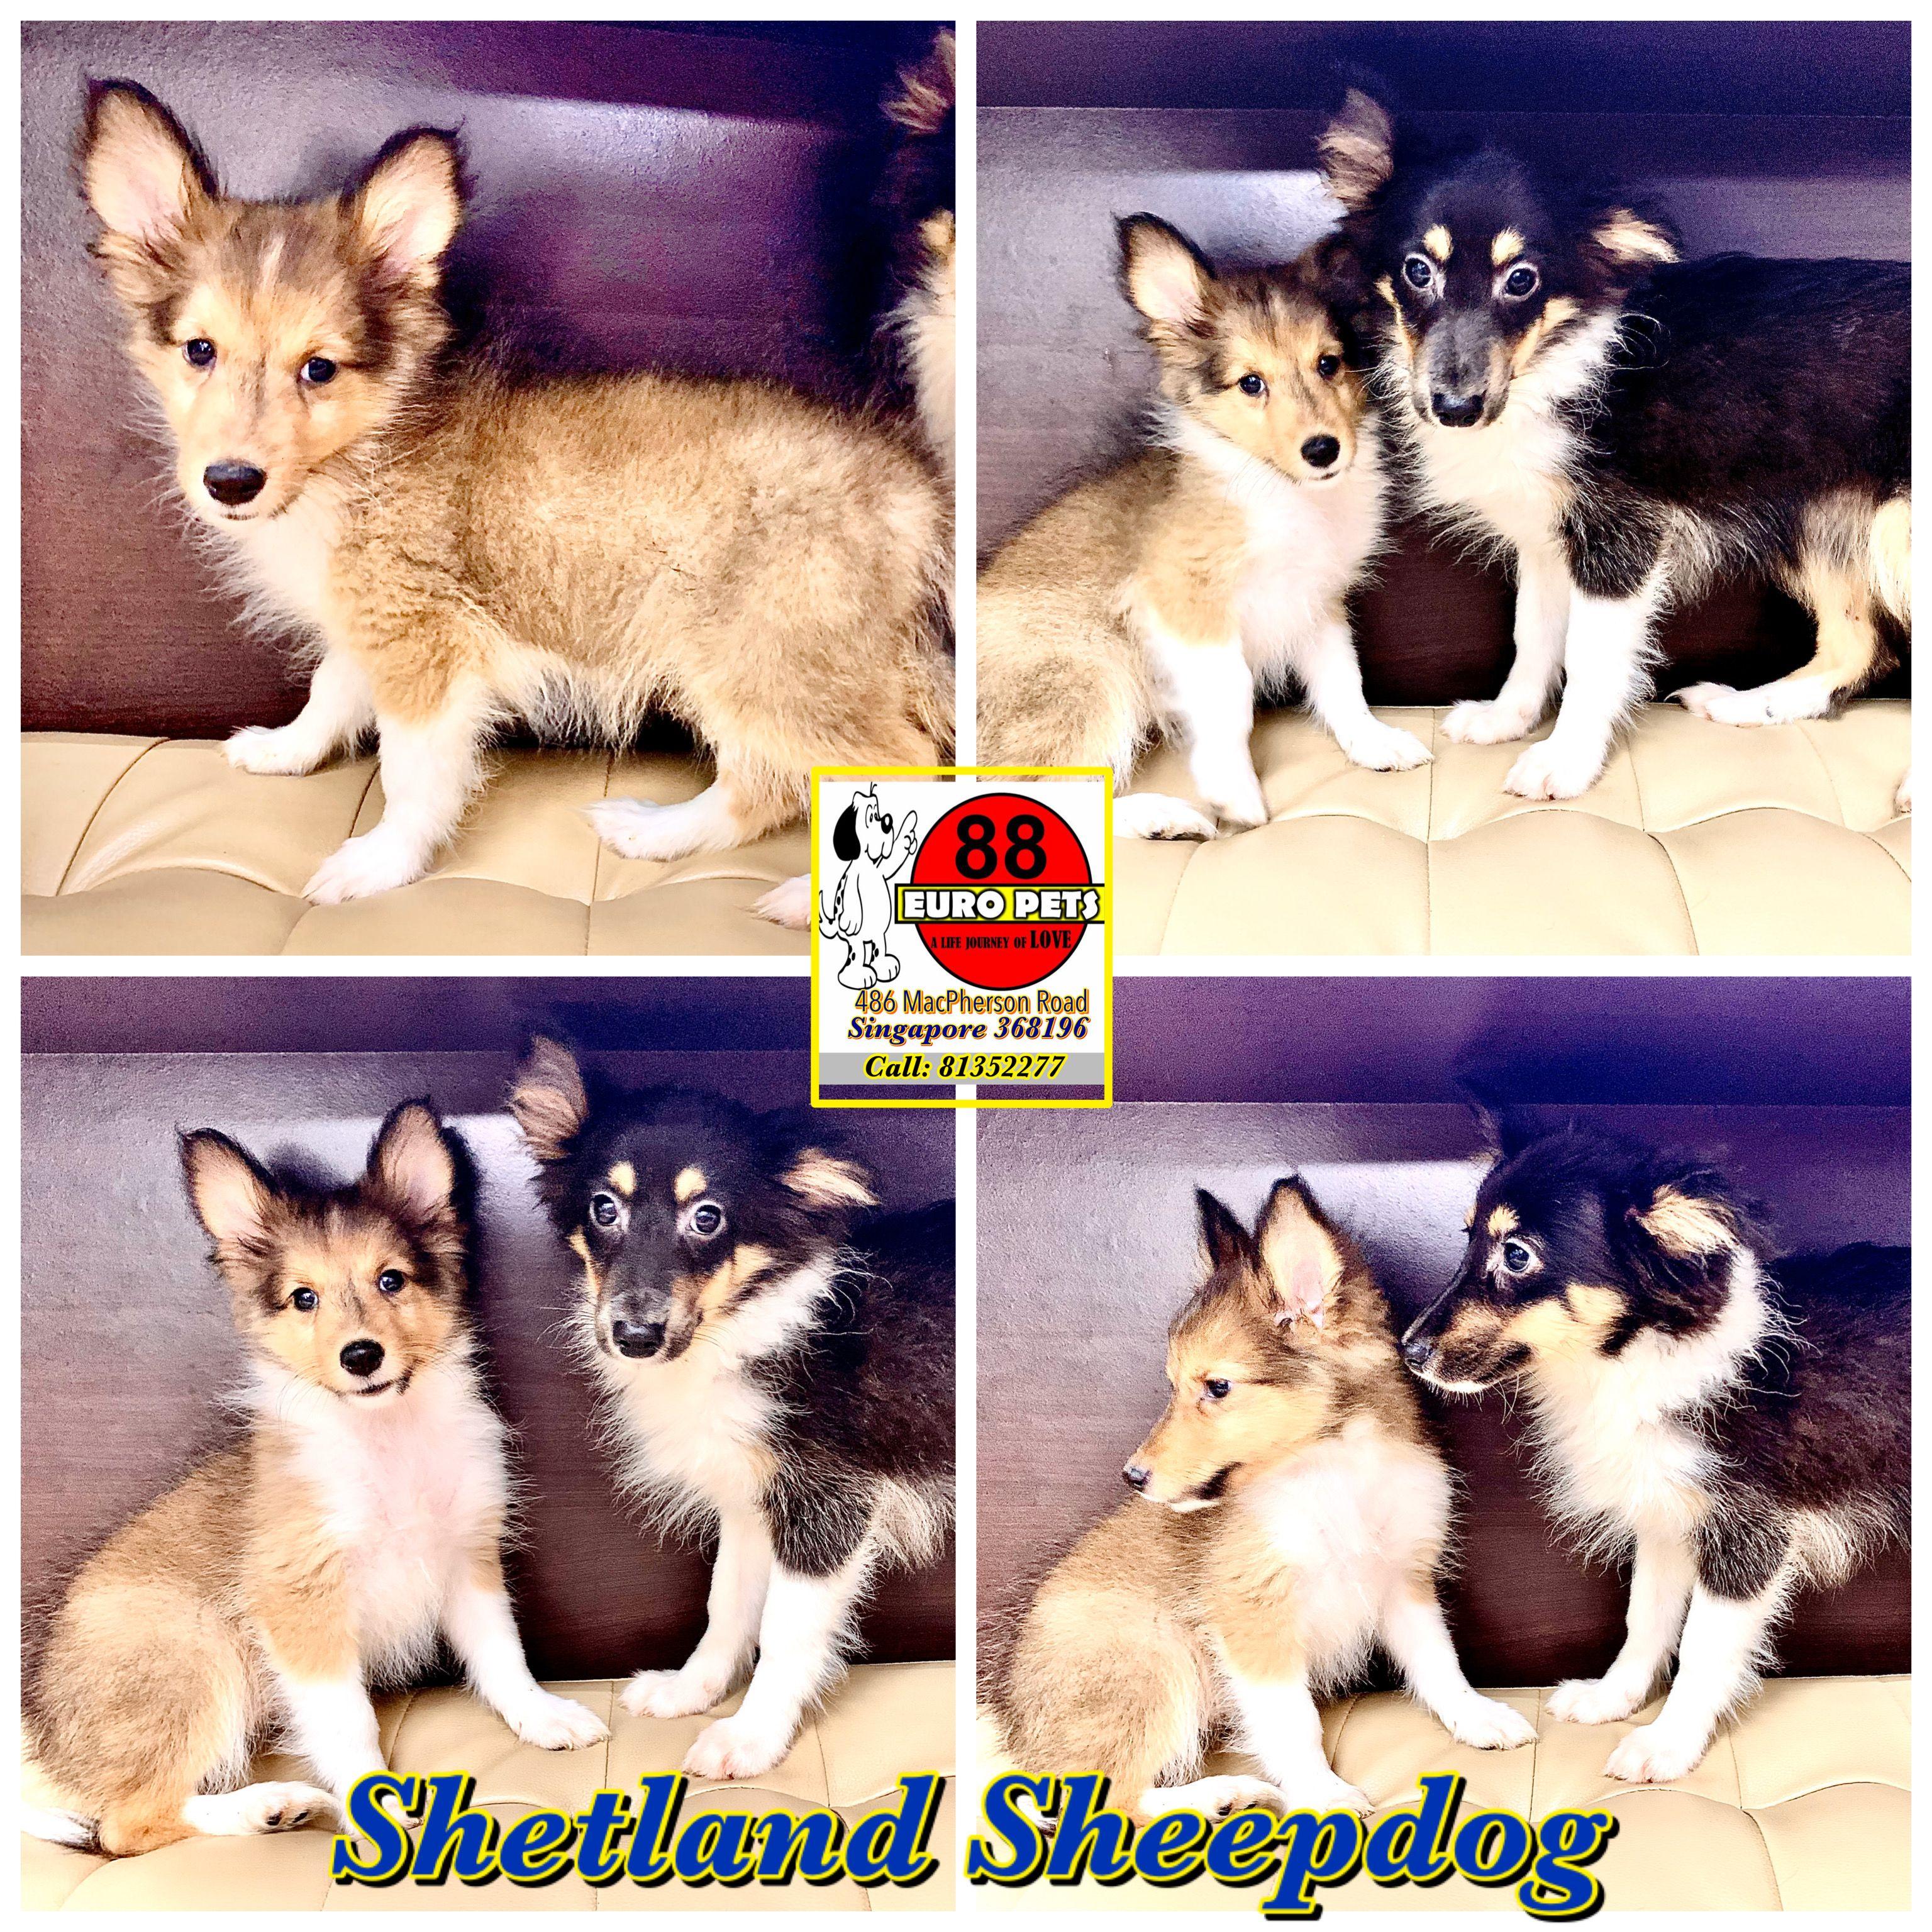 Shetland Sheepdog Full Collar 3 388 Female Available Call 81352277 Now Appointments Req Shetland Sheepdog Puppies Puppies For Sale Shetland Sheepdog